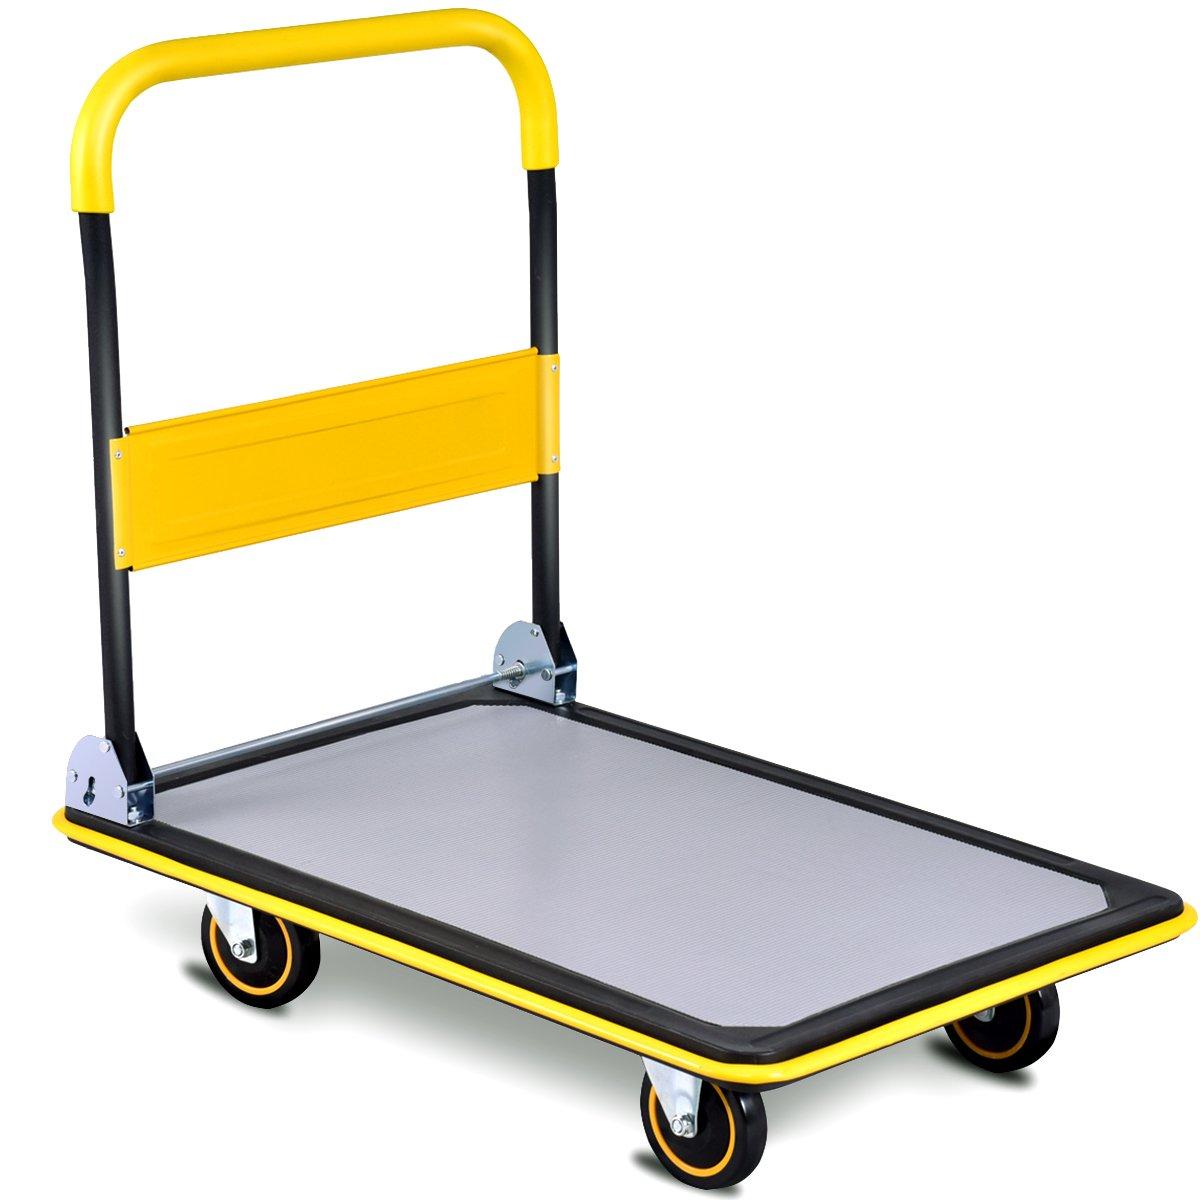 Goplus Folding Platform Cart 660LBS Rolling Flatbed Cart Hand Platform Truck Push Dolly for Loading